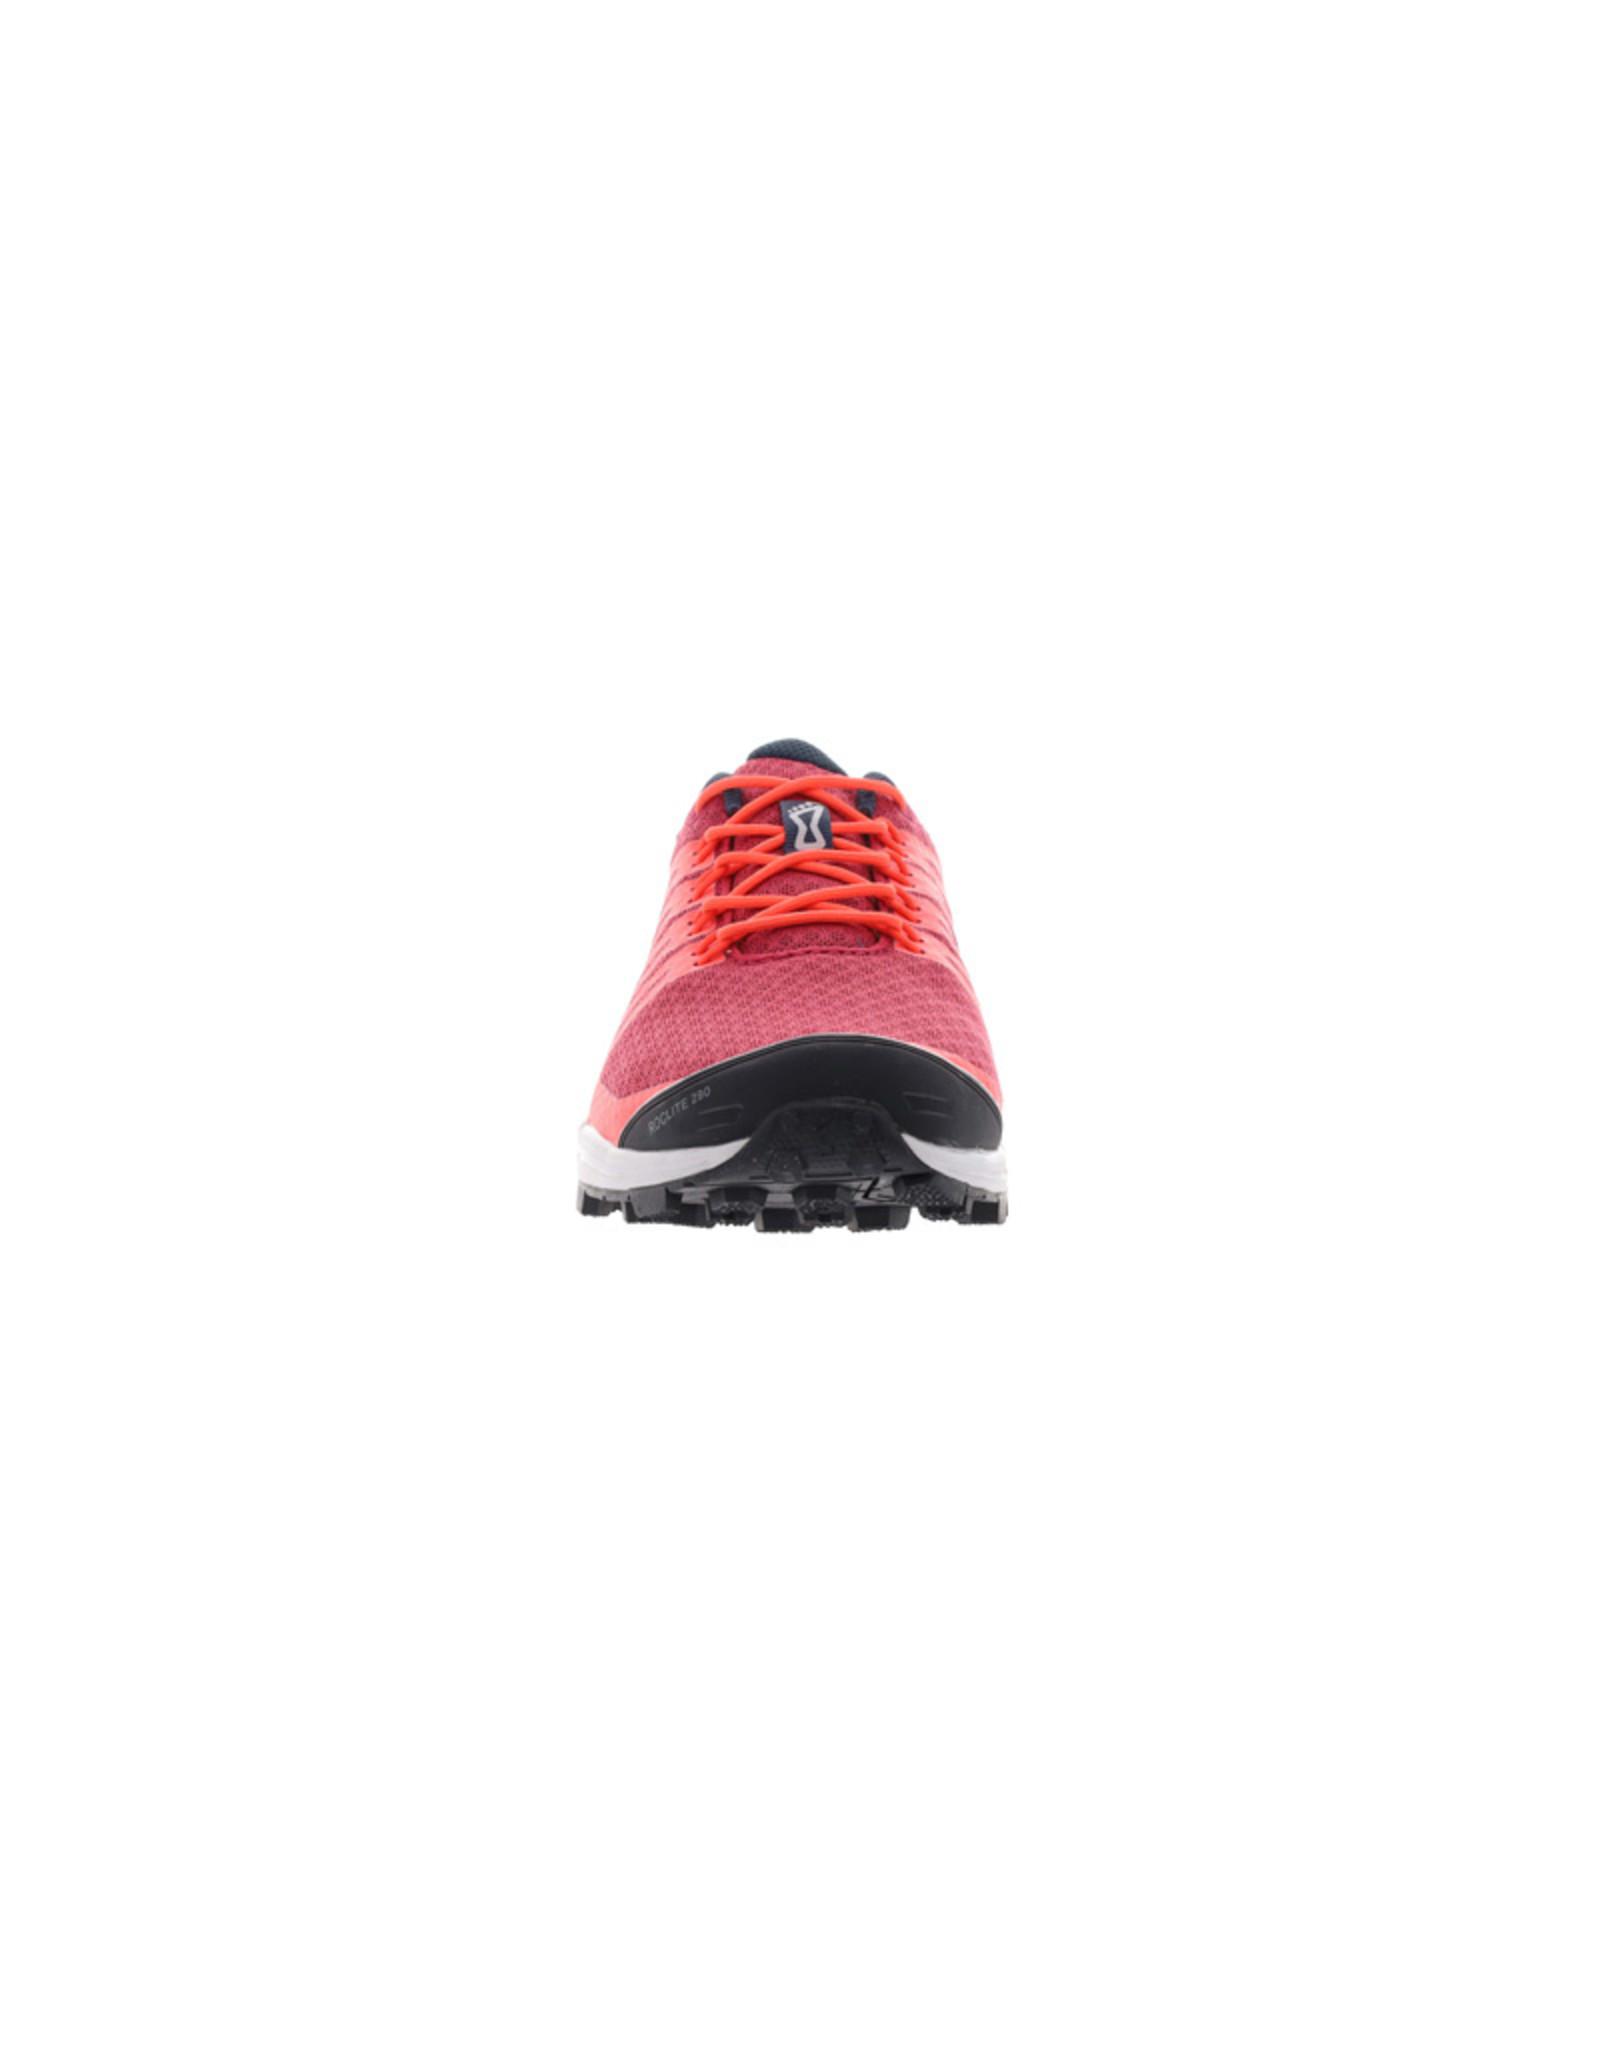 Inov-8 Roclite G 290 Chaussure Trailrun - Violet/Rose